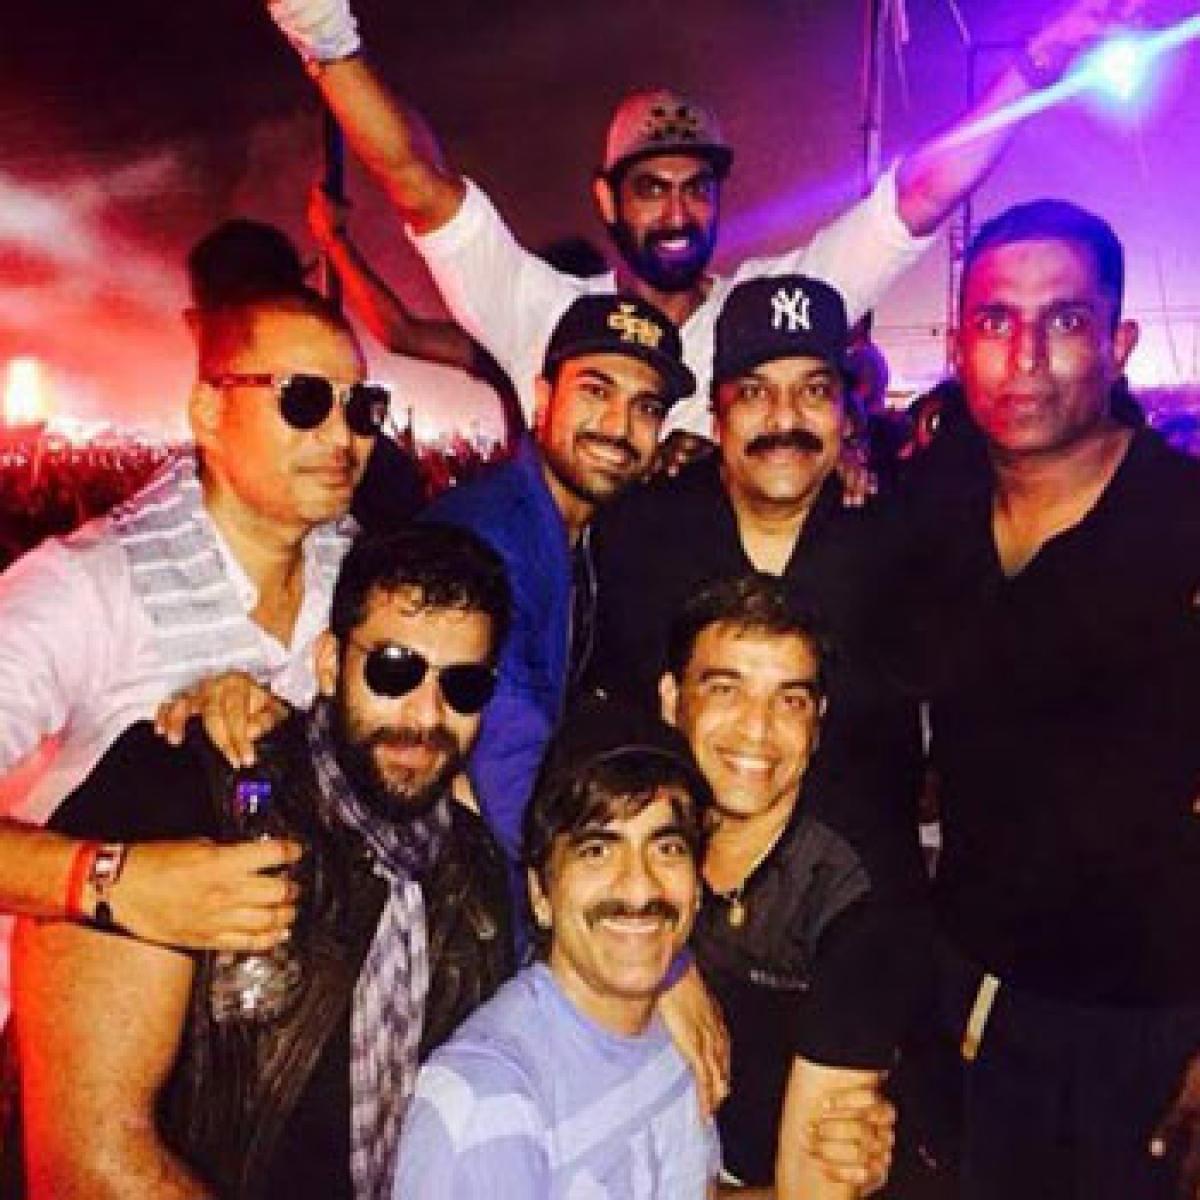 Tollywood stars had a blast at the Sunburn festival 2015 in Goa